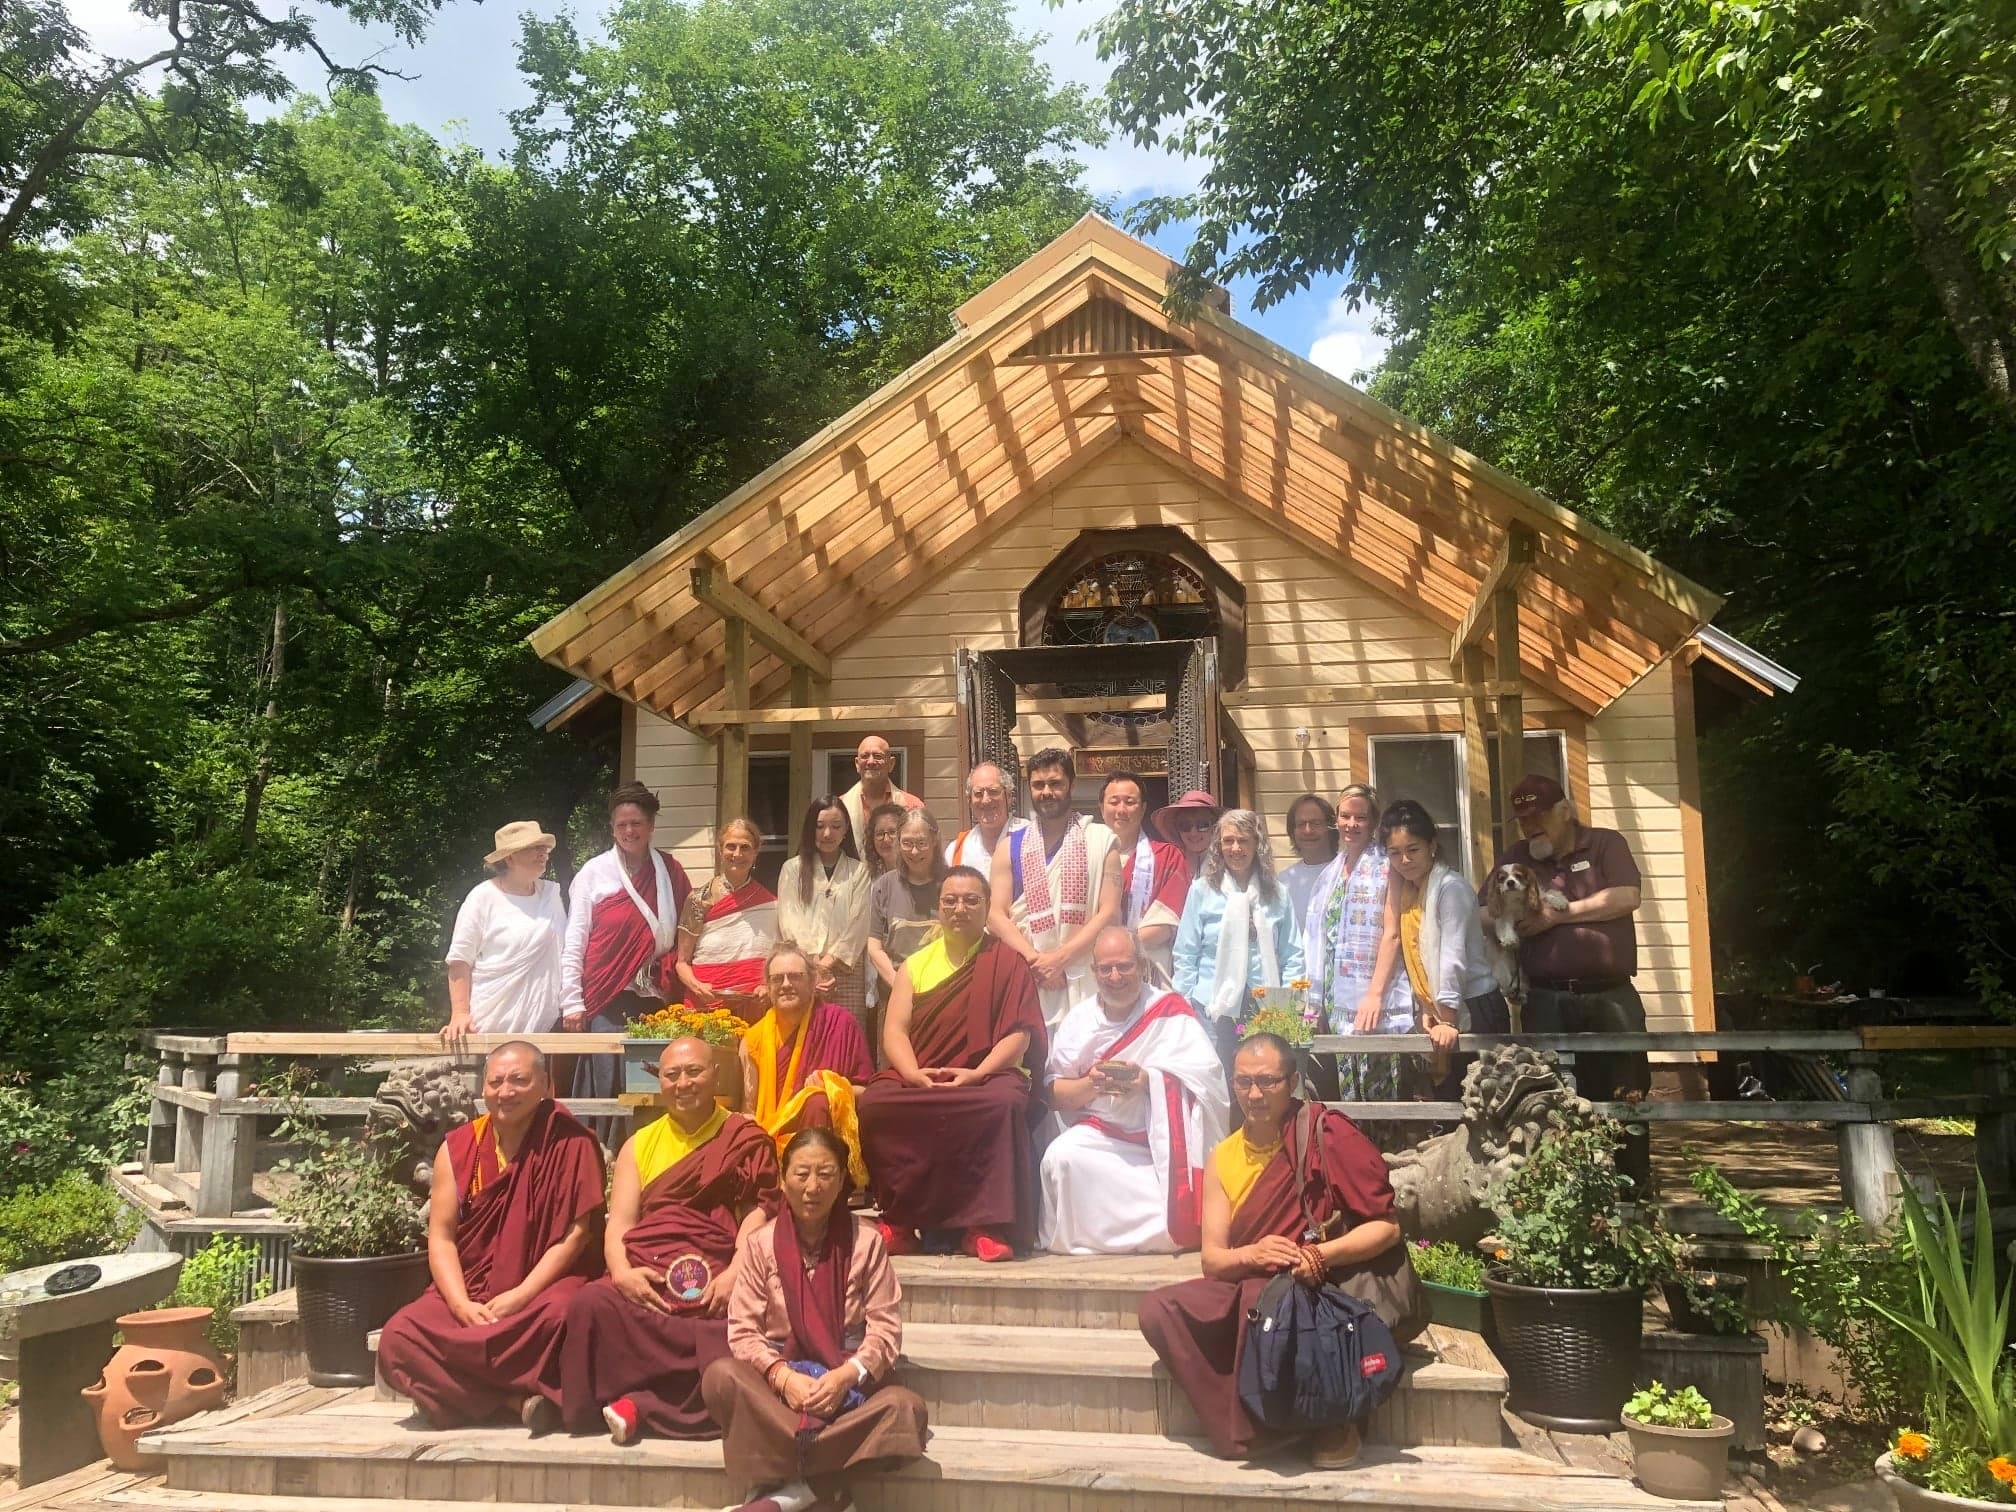 HH Yangsi Dudjom Pema Shepa Rinpoche at Bodhivastu's Big Indian Meditation Retreat Center